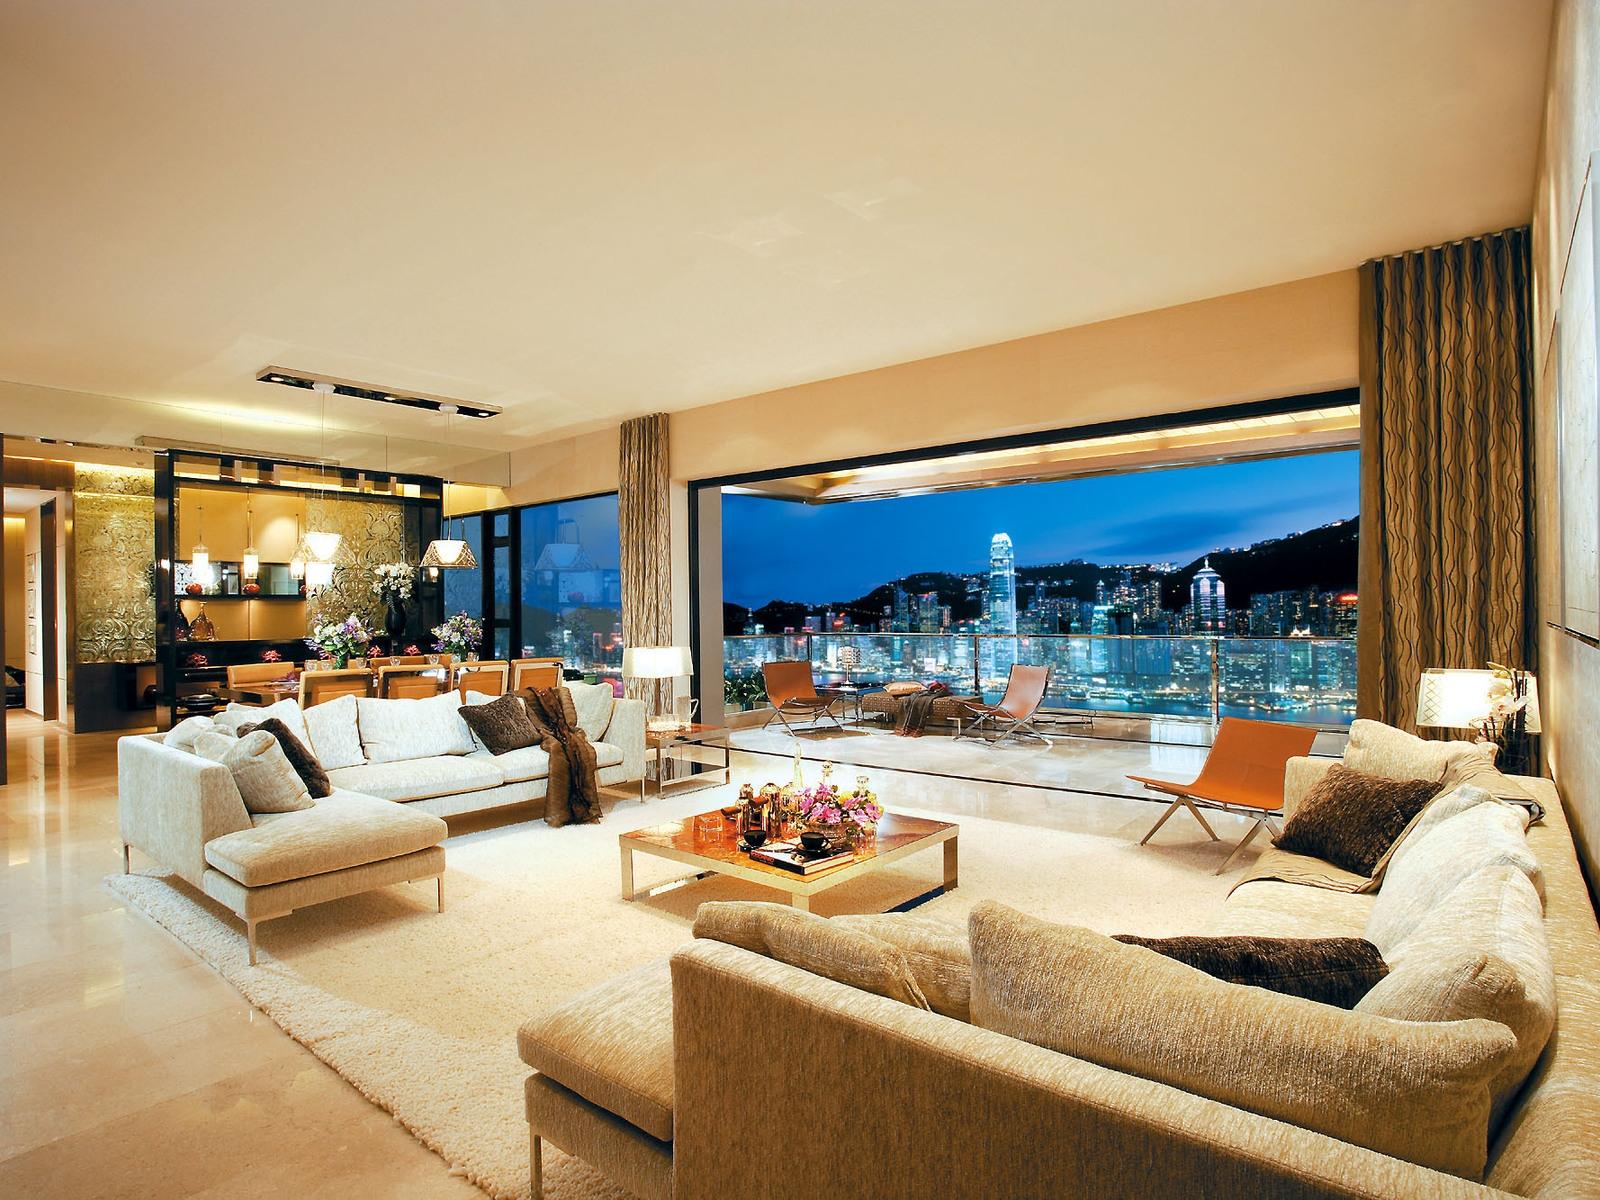 Luxurious-Mansion-Interior-Design-Ideas